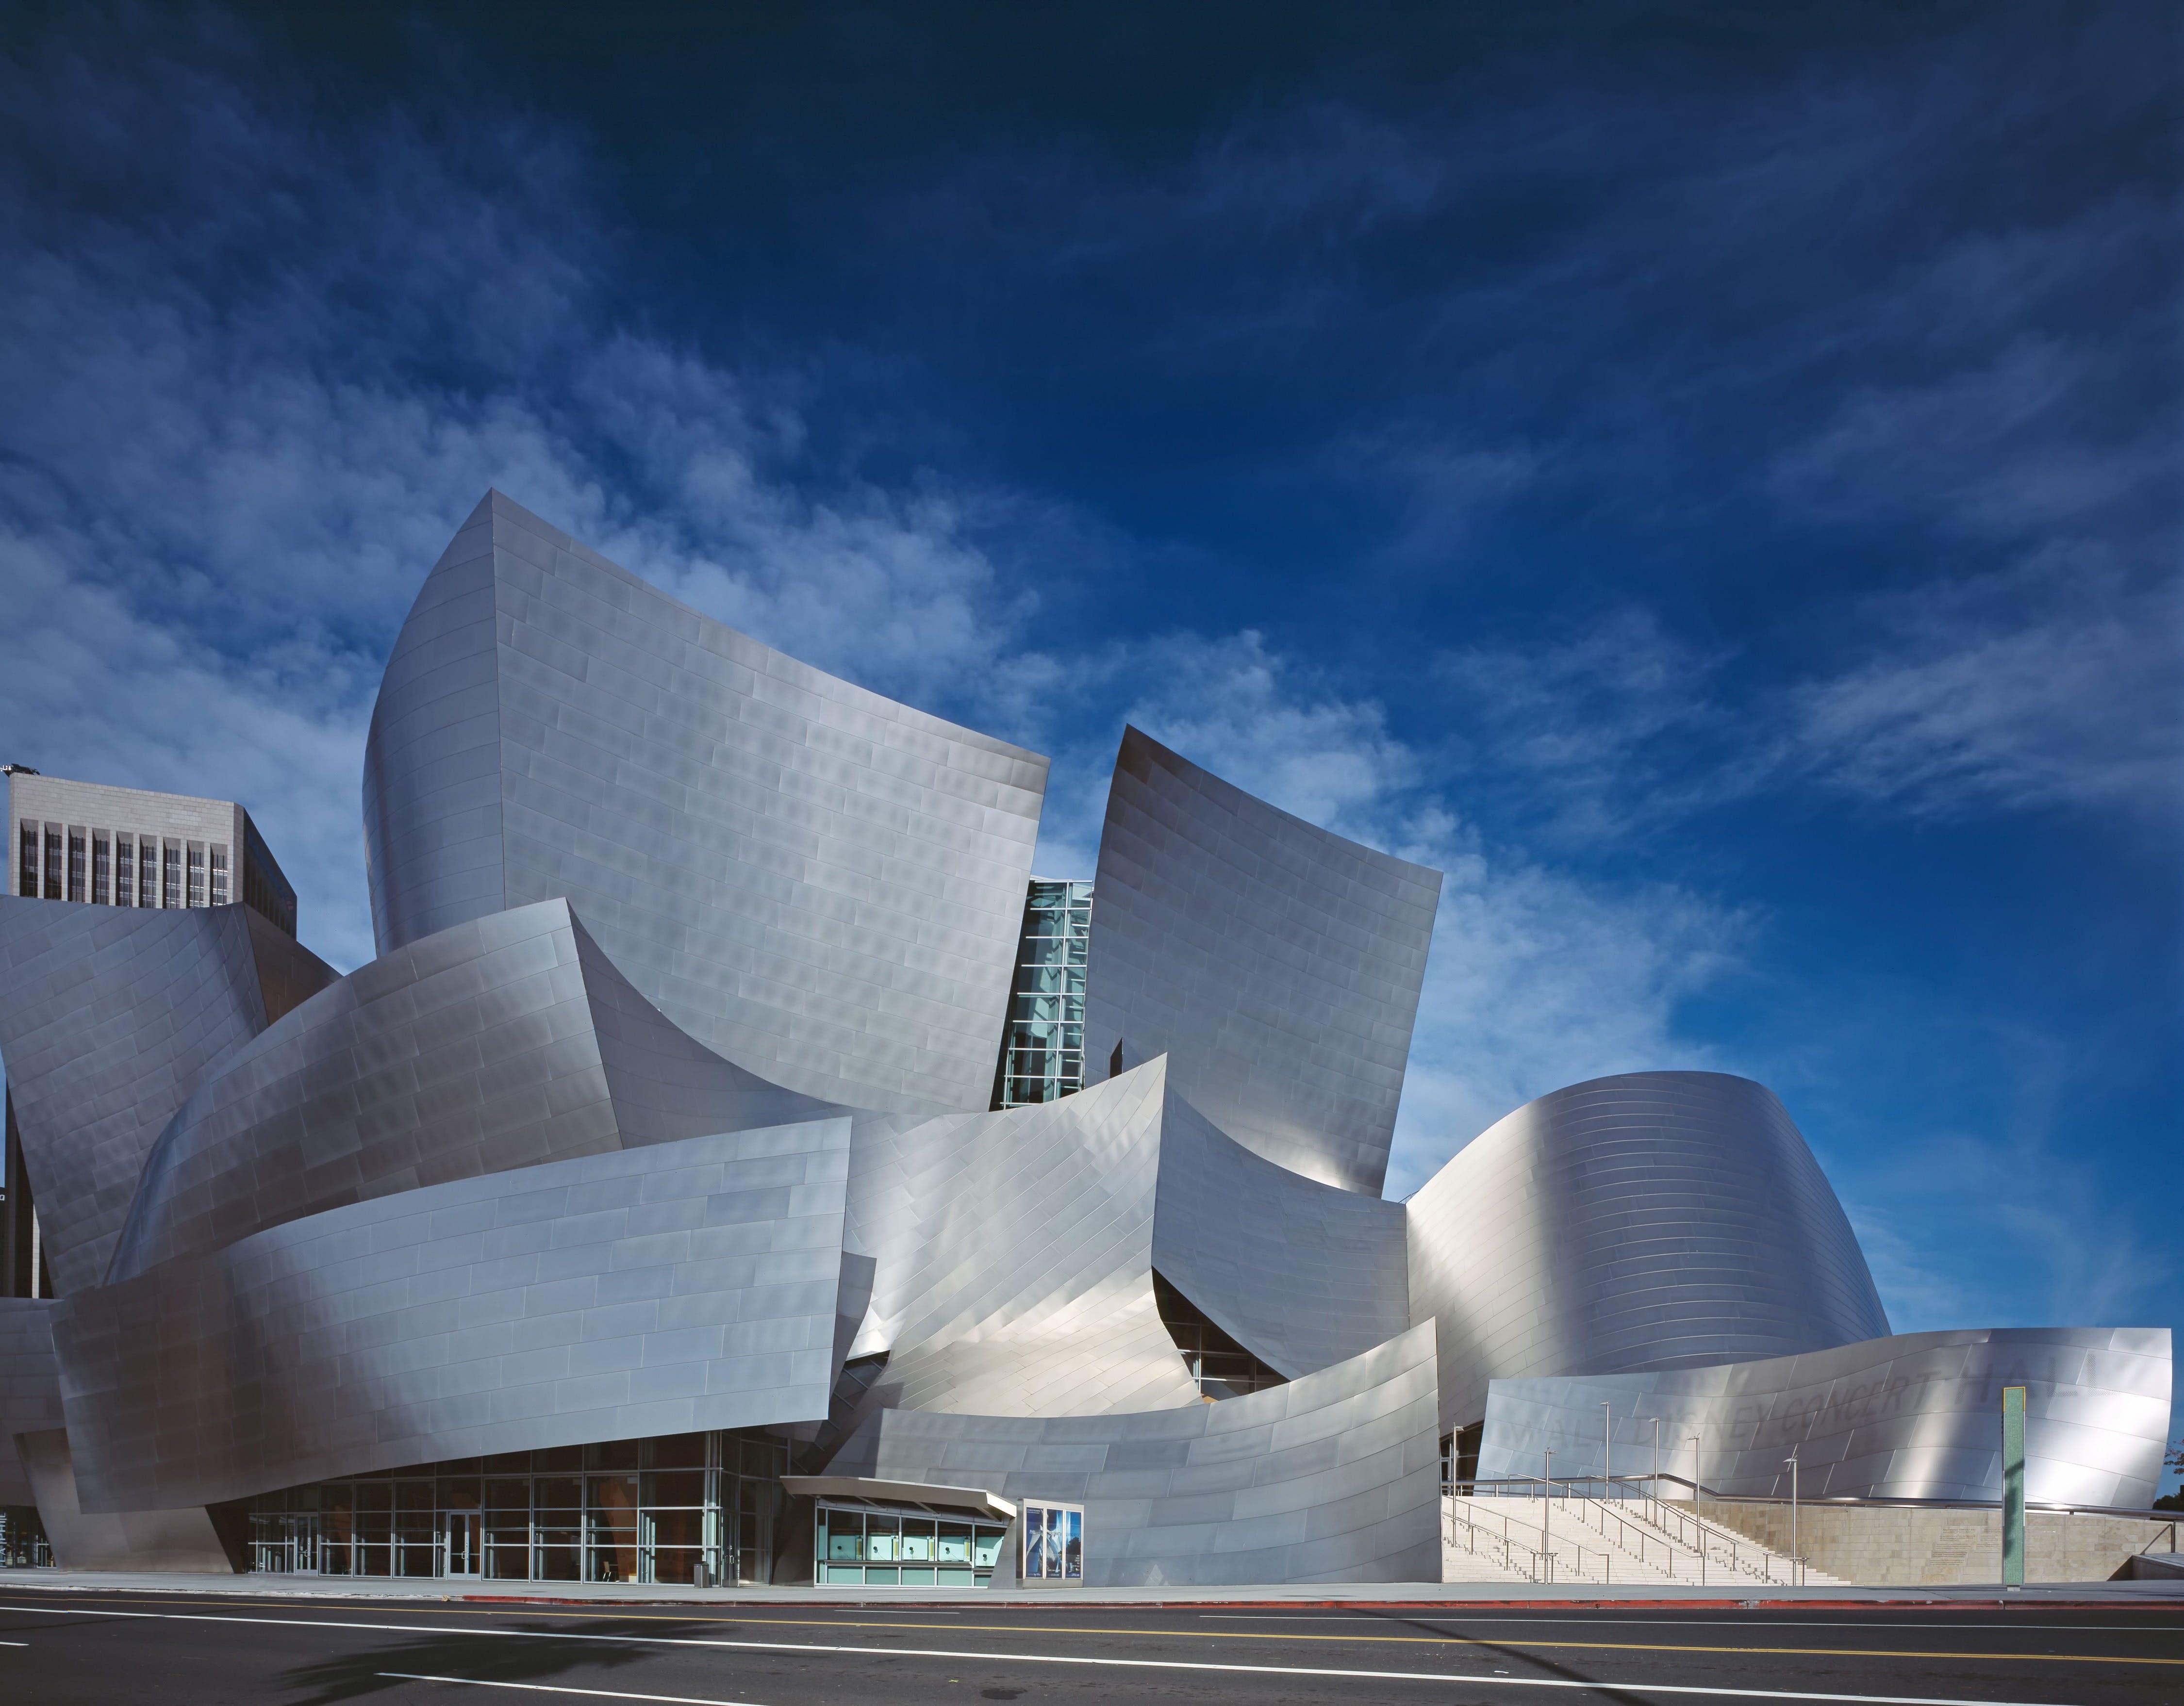 Fotos de stock gratuitas de arquitectura, contemporáneo, edificio, futurista